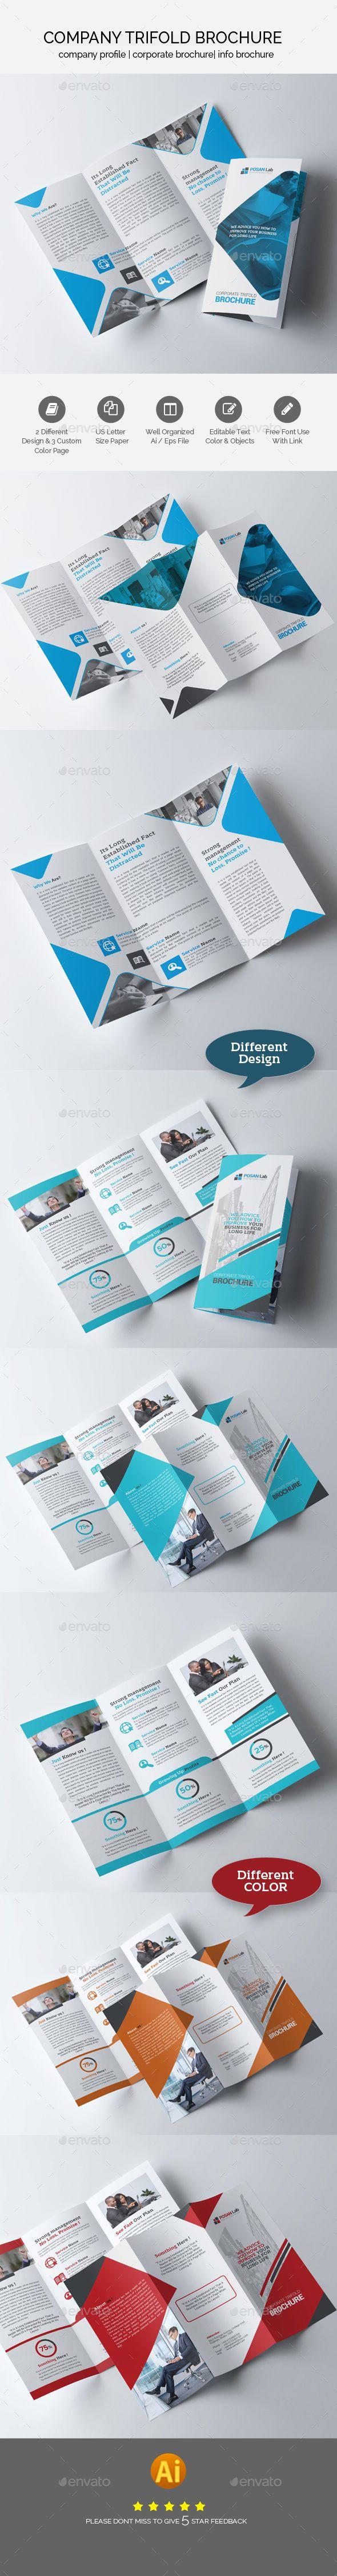 Business Trifold Brochure Design Bundle Templates Vector EPS, AI Illustrator